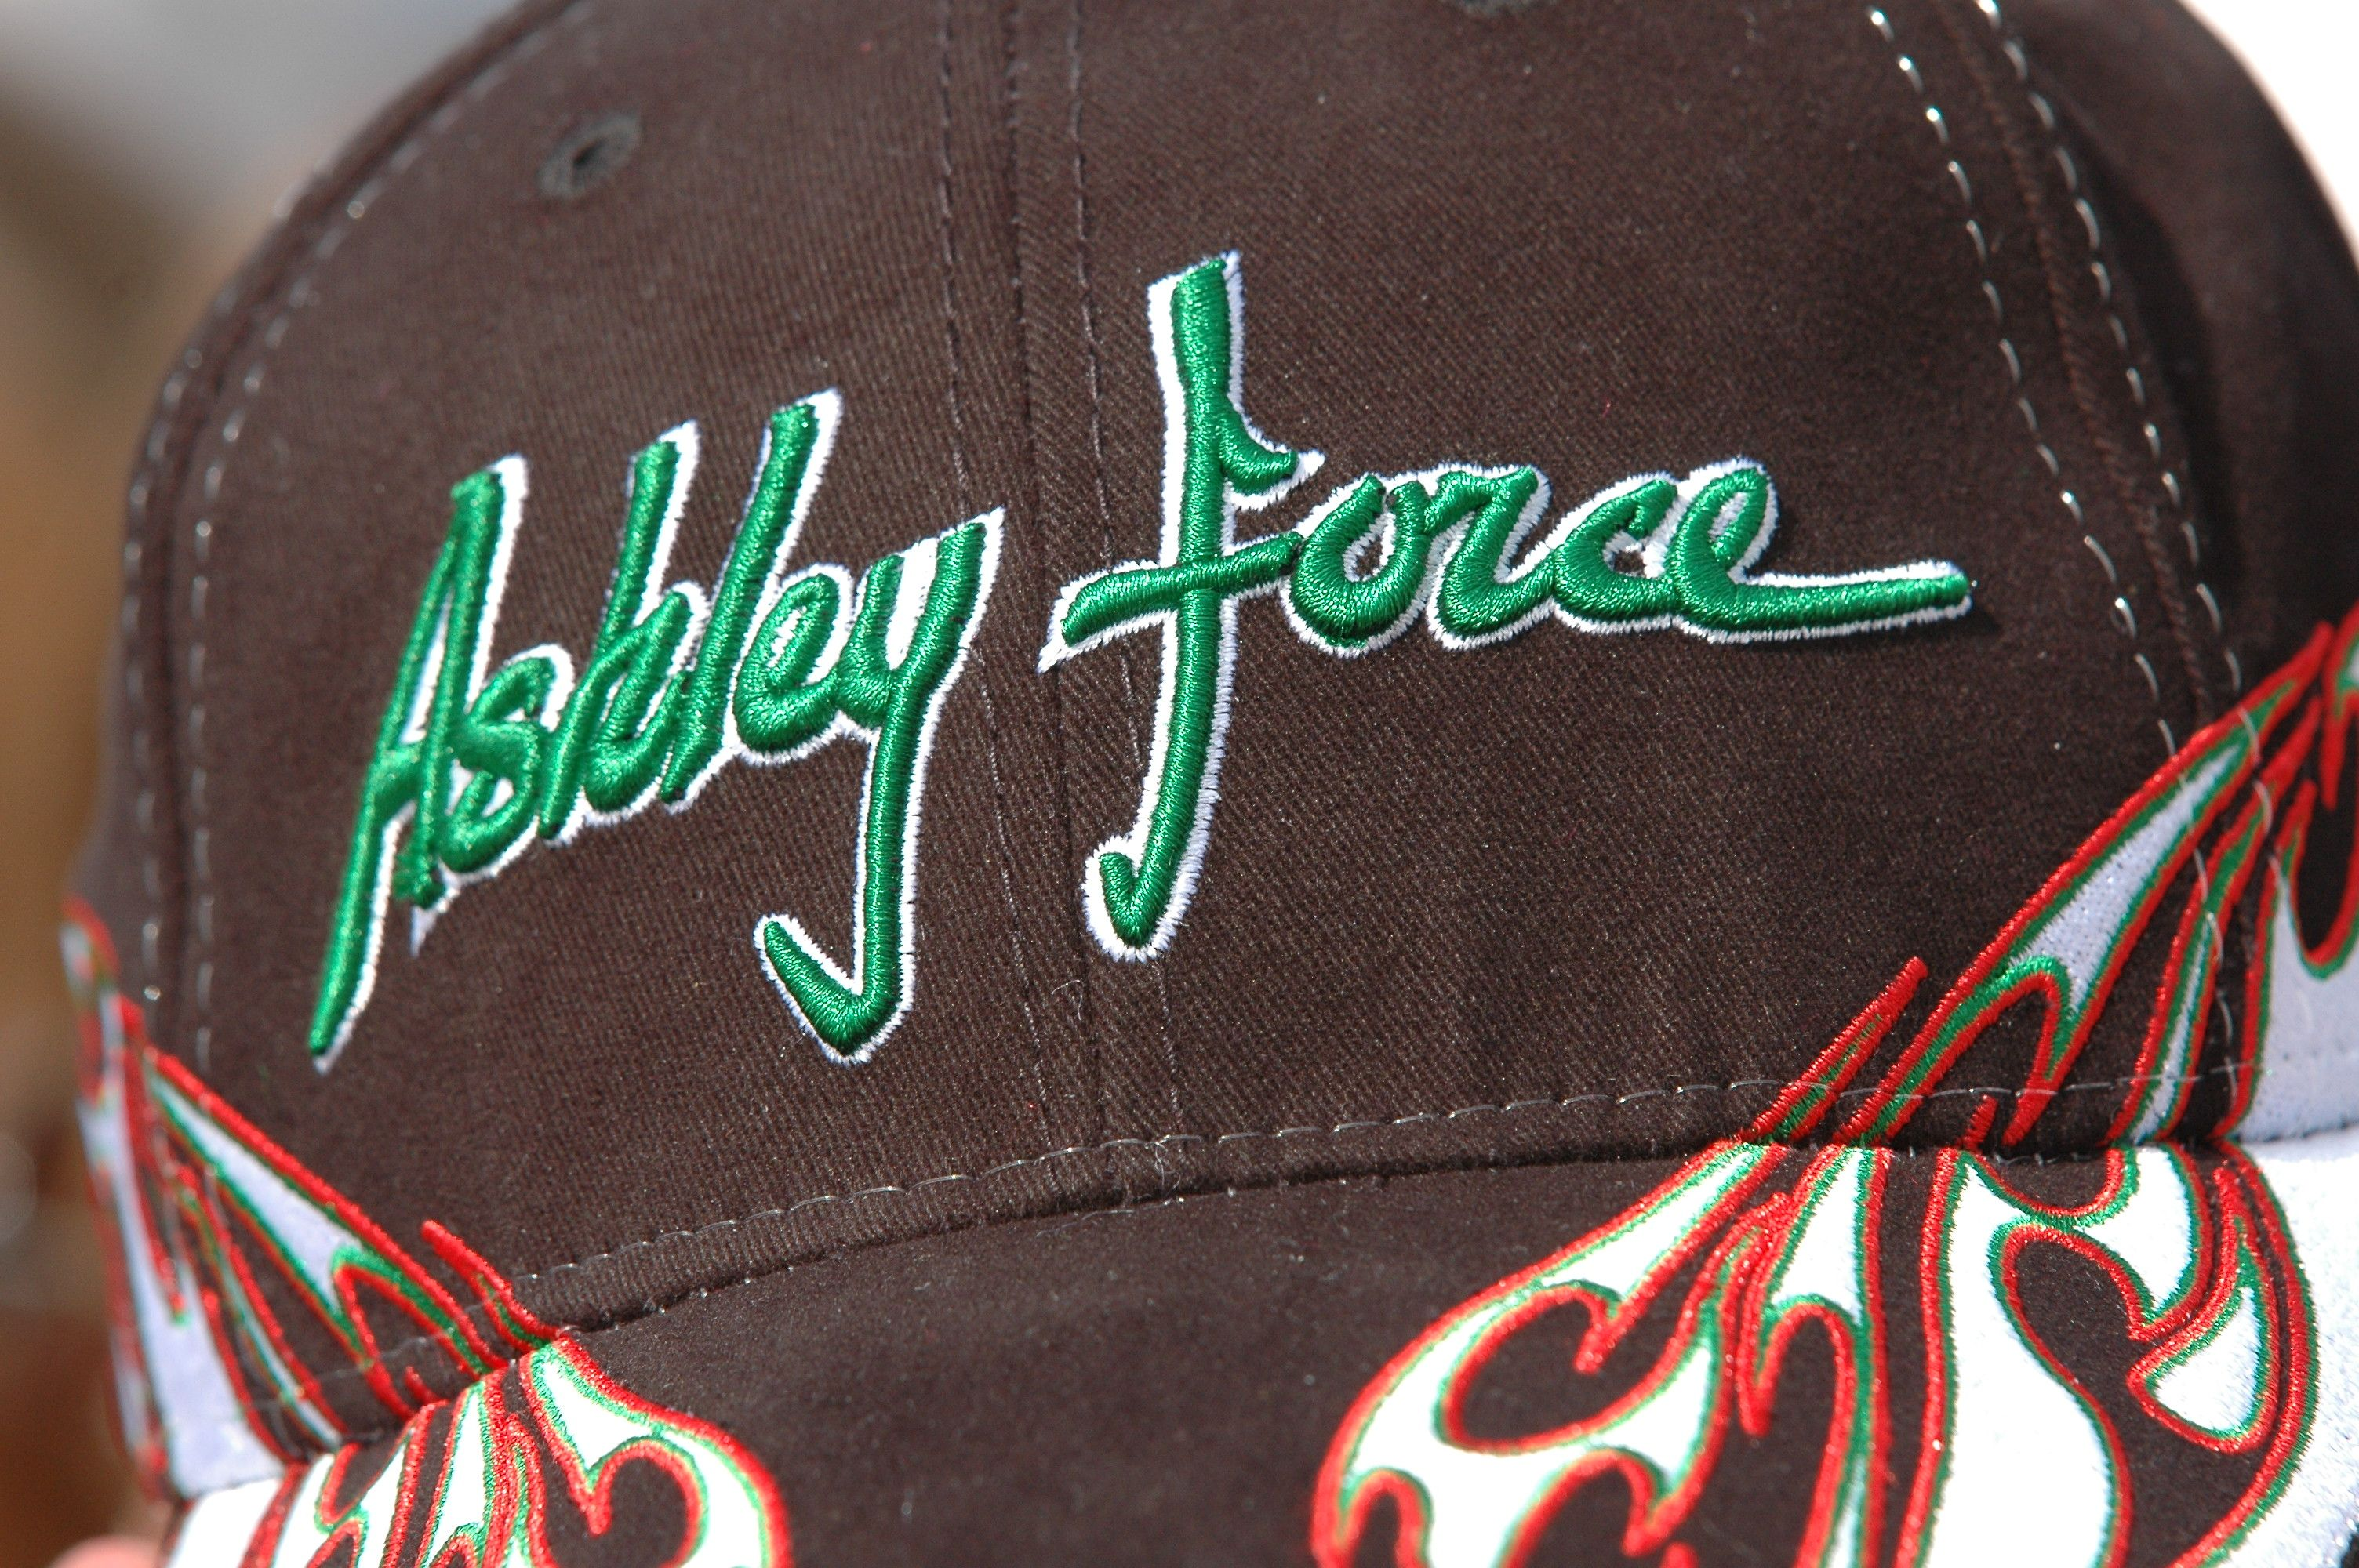 Ashley Force